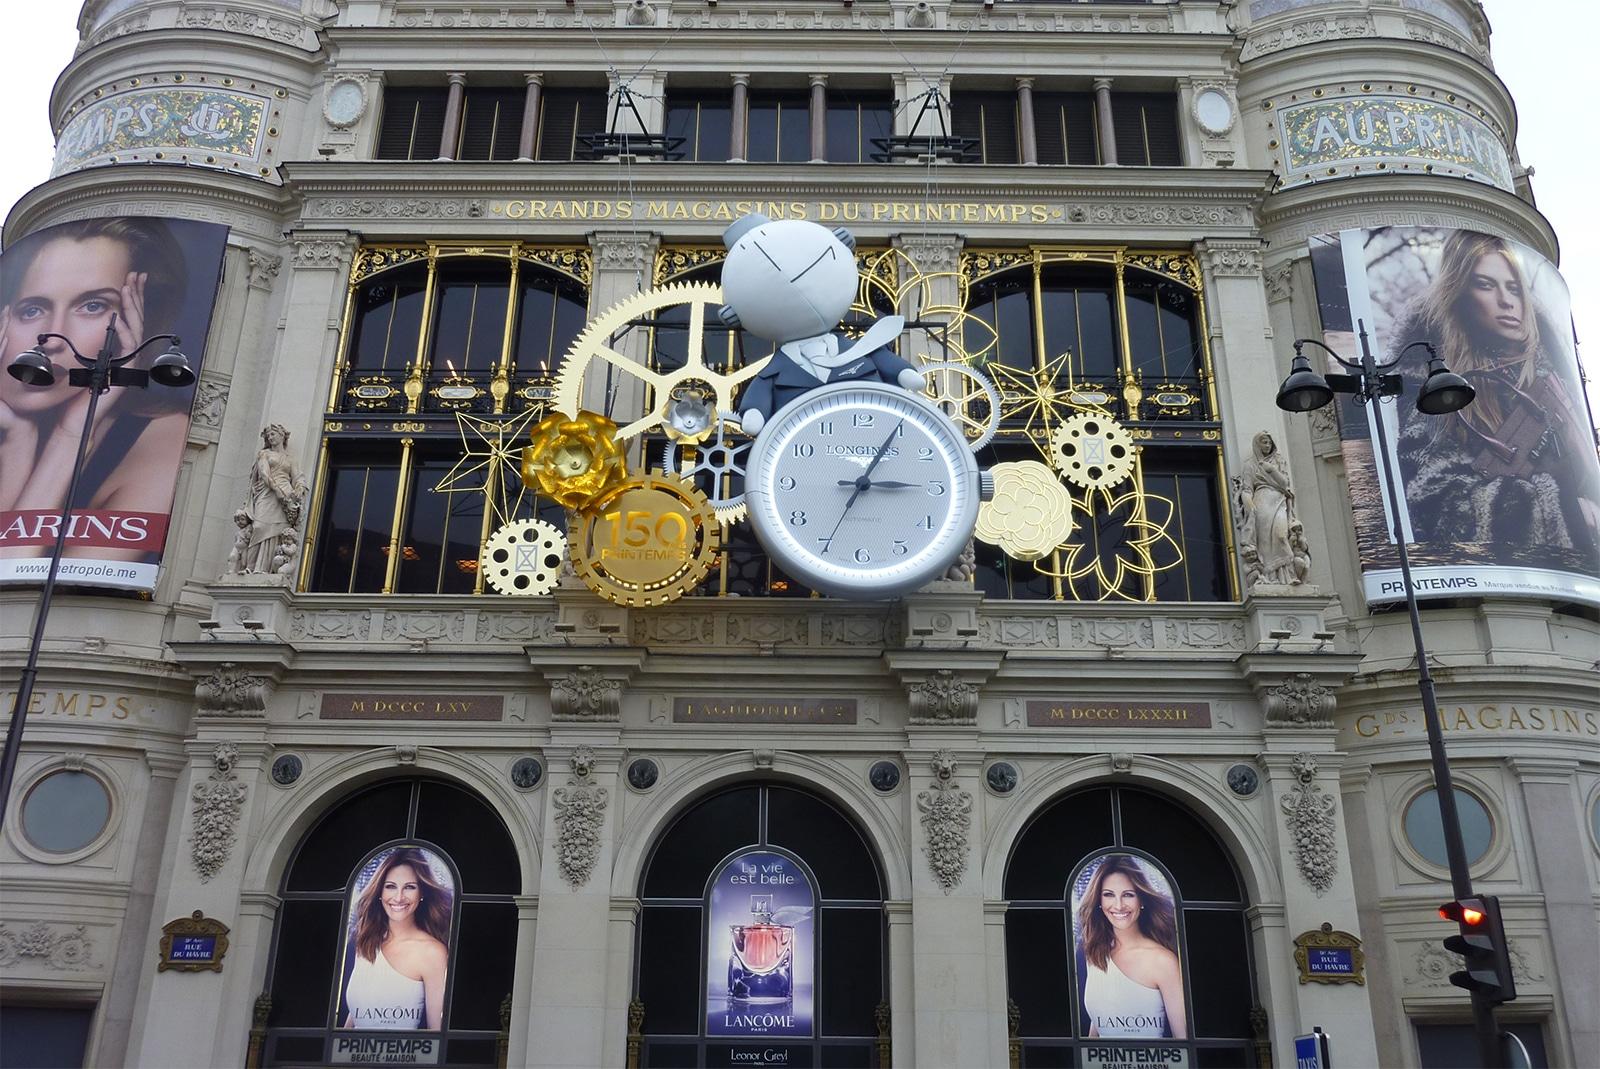 Horloge Monumentale sur gare